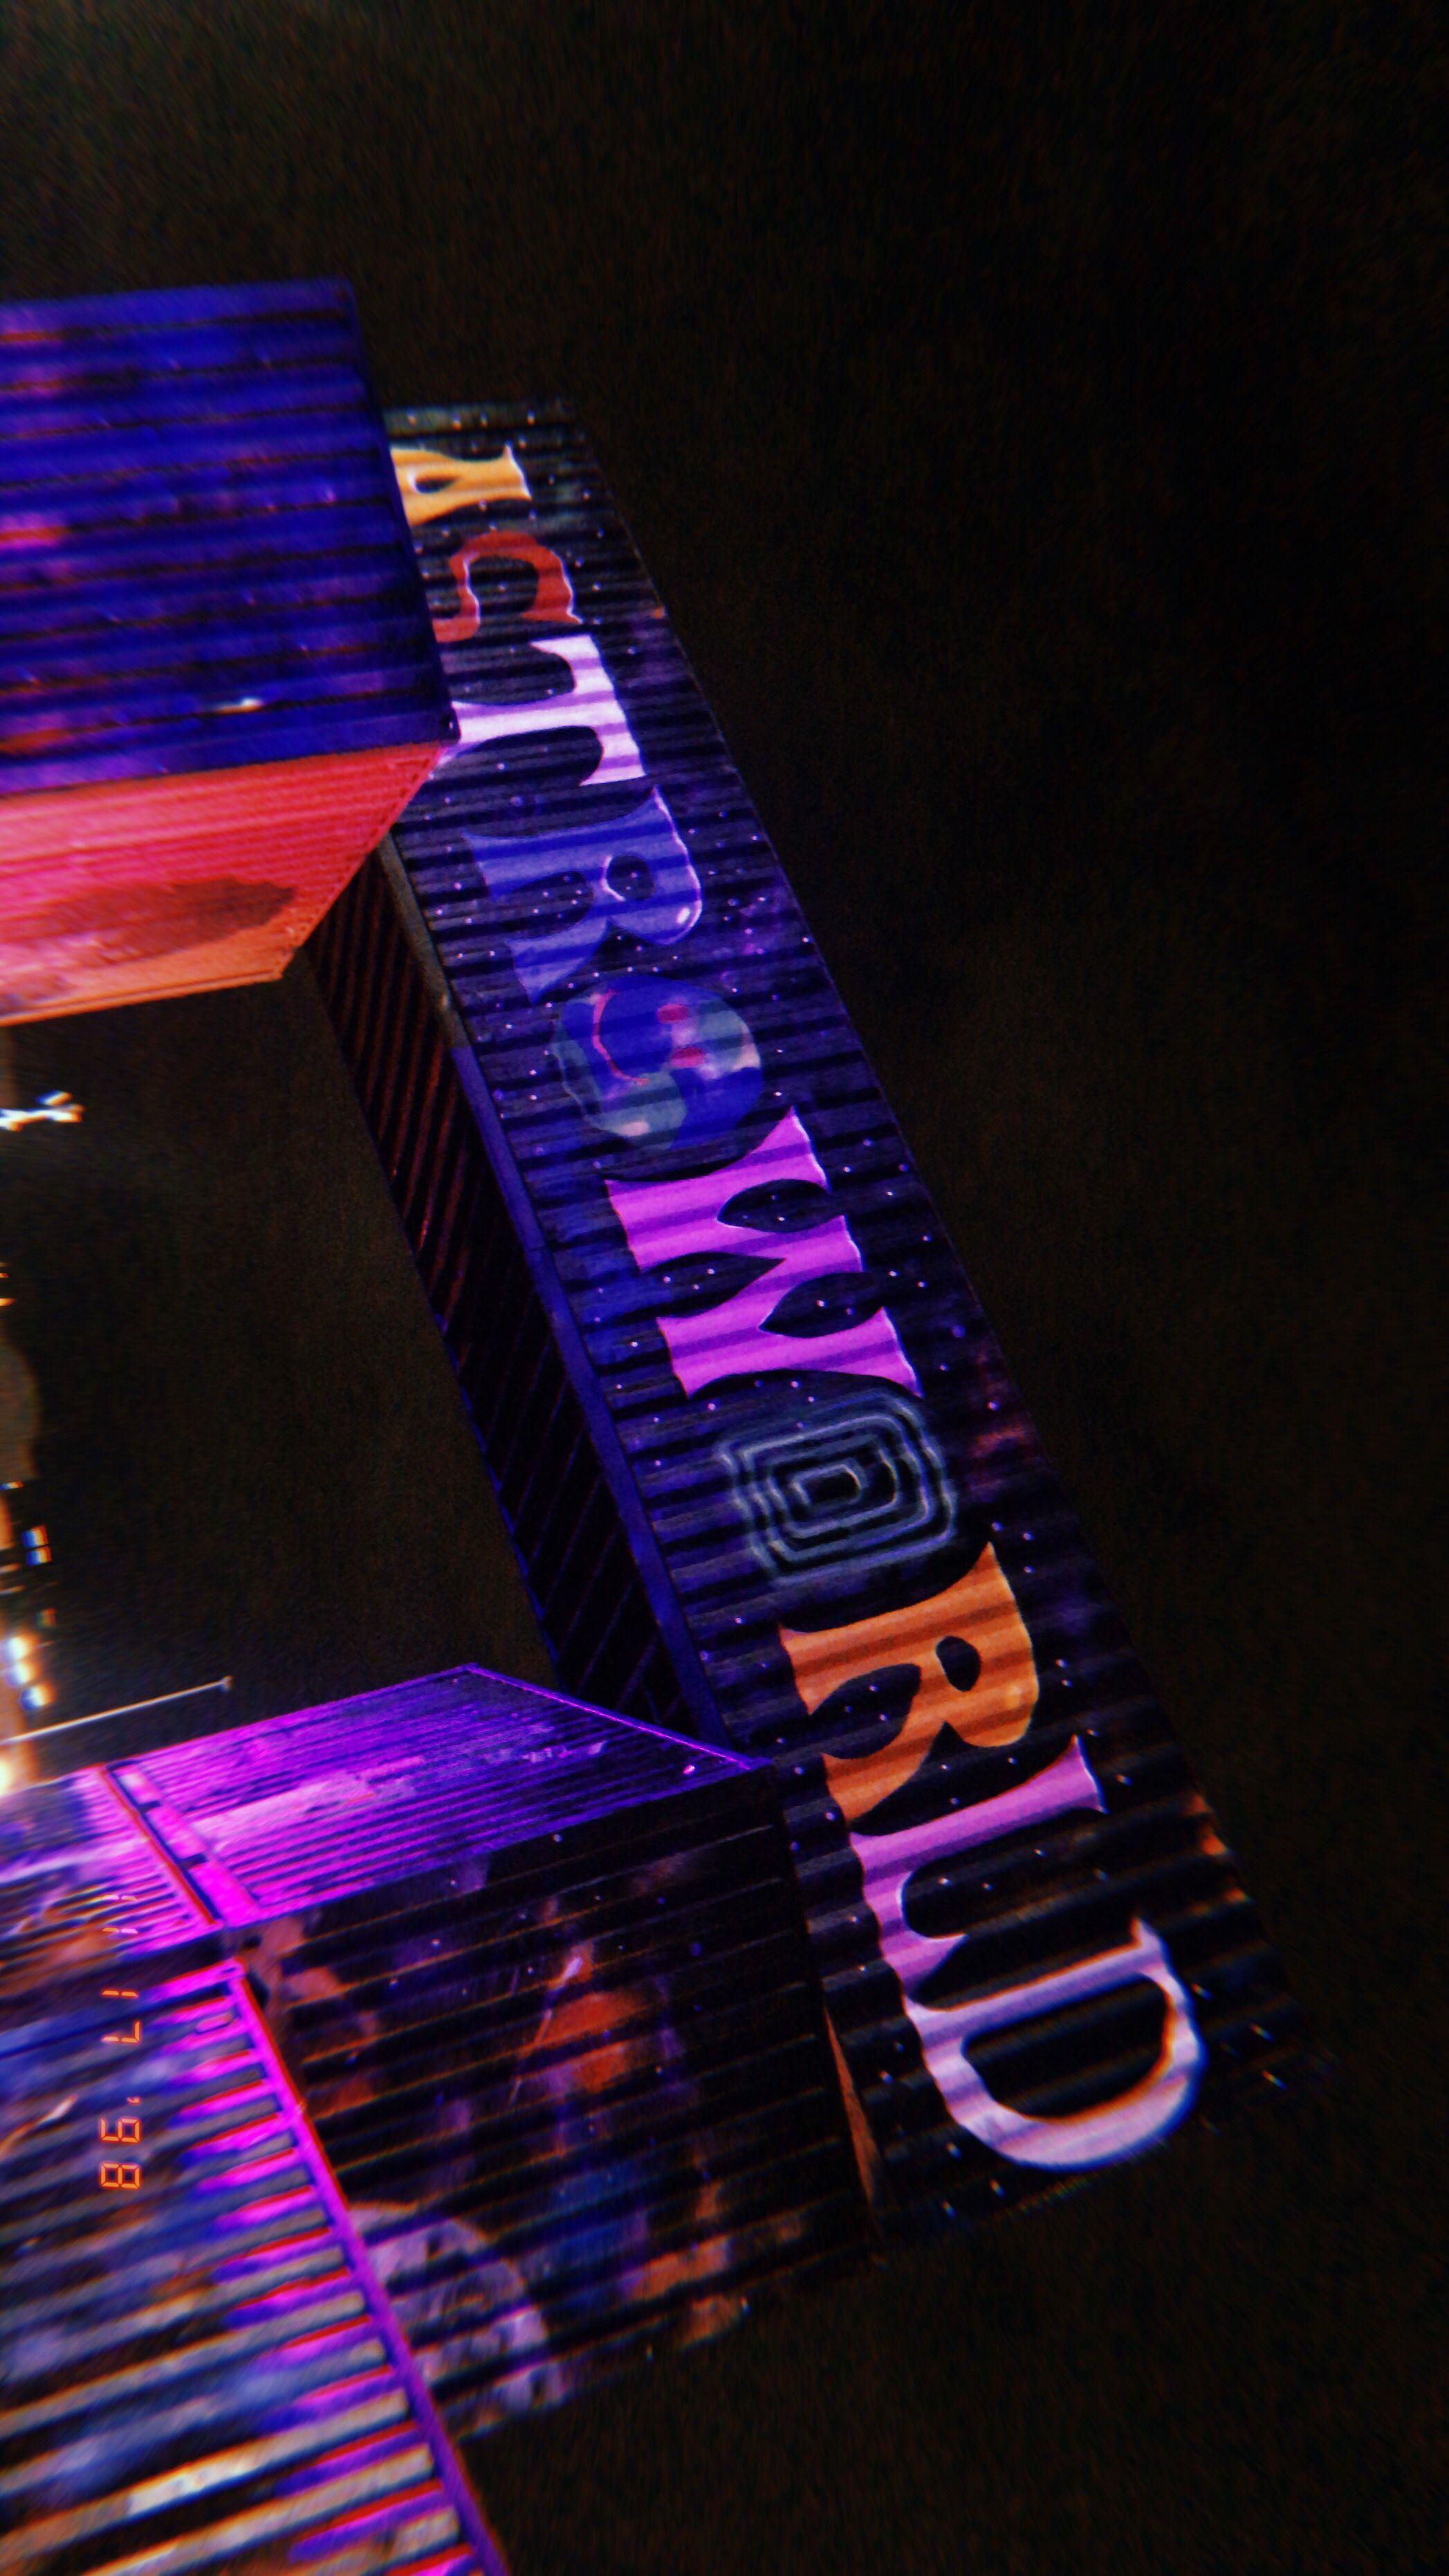 Astroworld Fest Travisscottwallpapers Travis Scott Concert Houston Tx Travisscottwallpapers Travis Scott Iphone Wallpaper Aesthetic Pastel Wallpaper Edgy Wallpaper